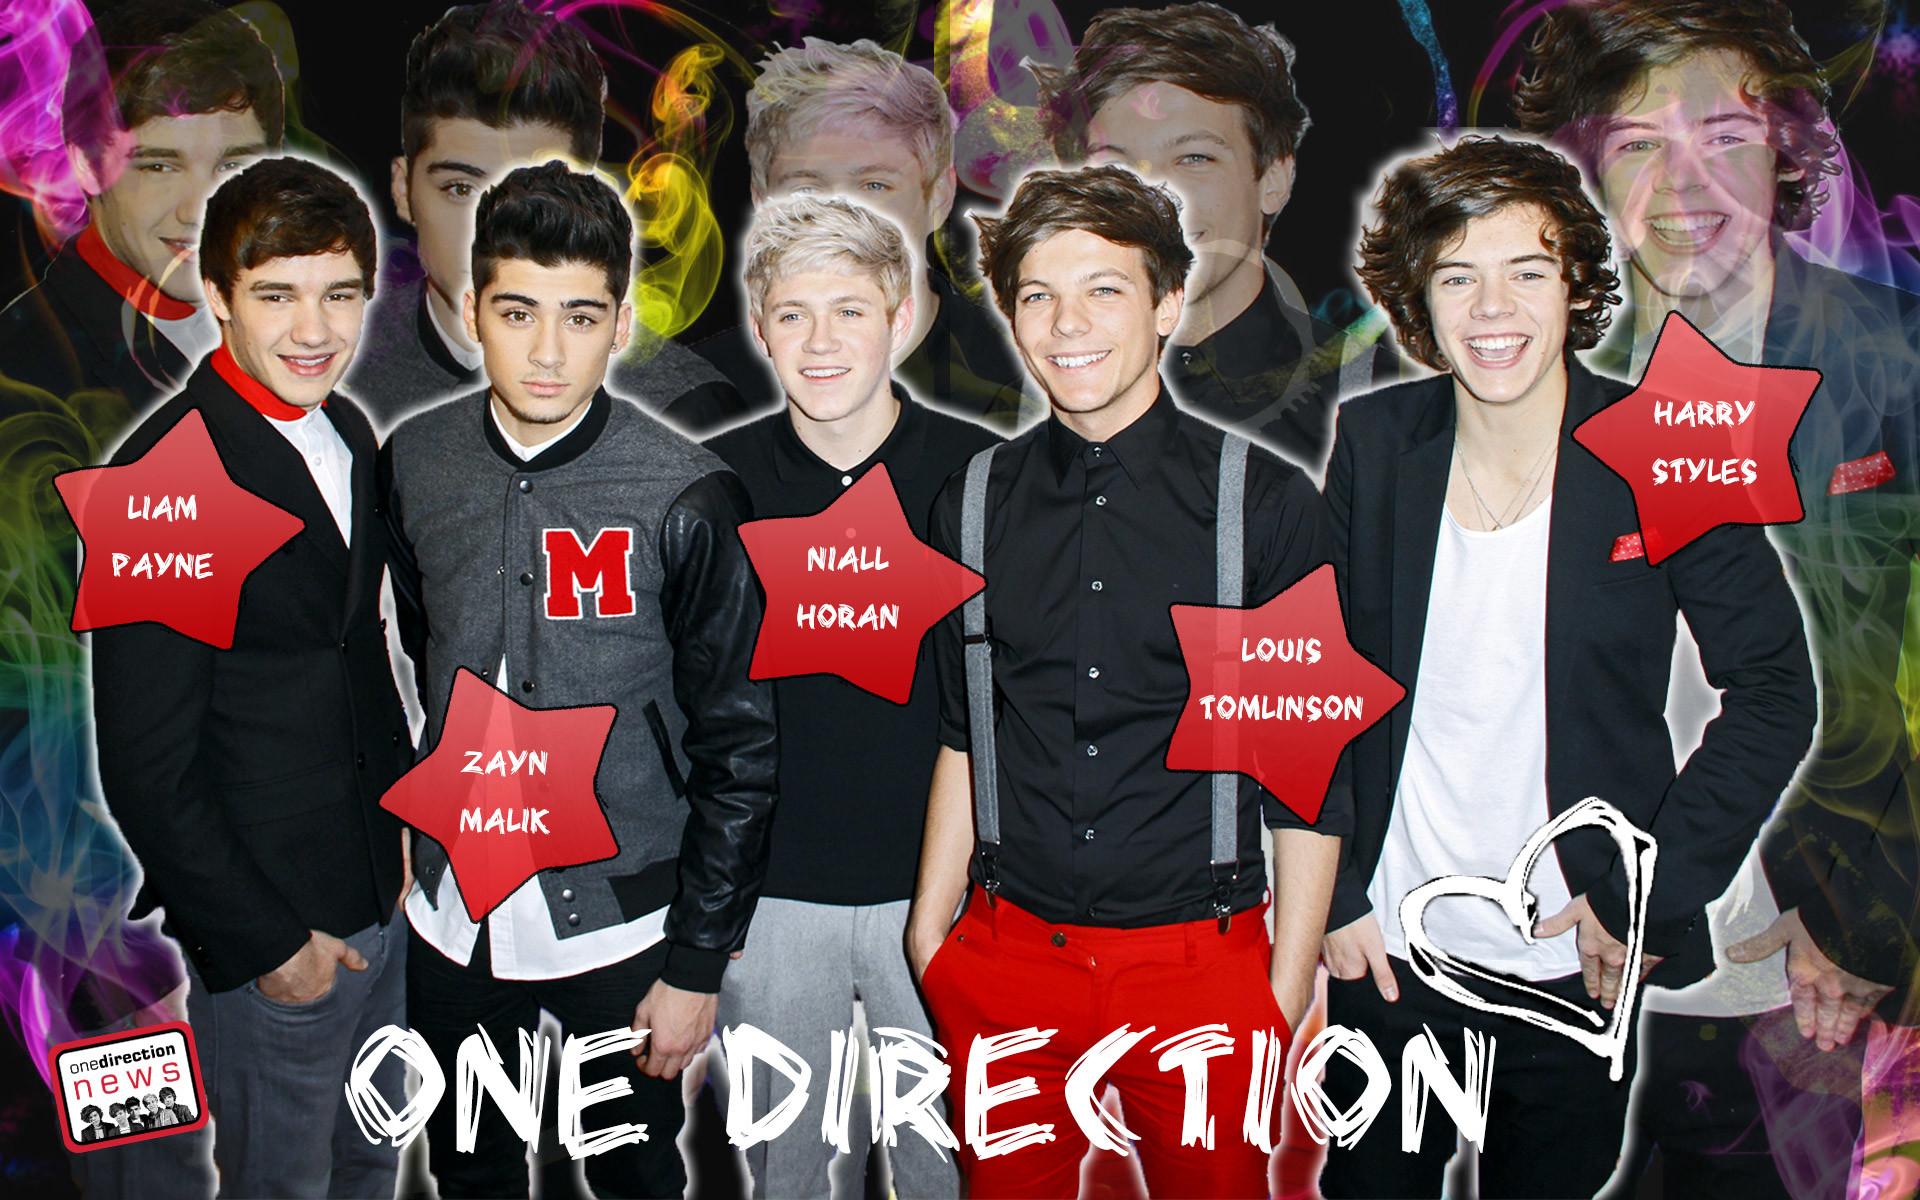 One Direction Wallpaper – one direction wallpapers – image group #5